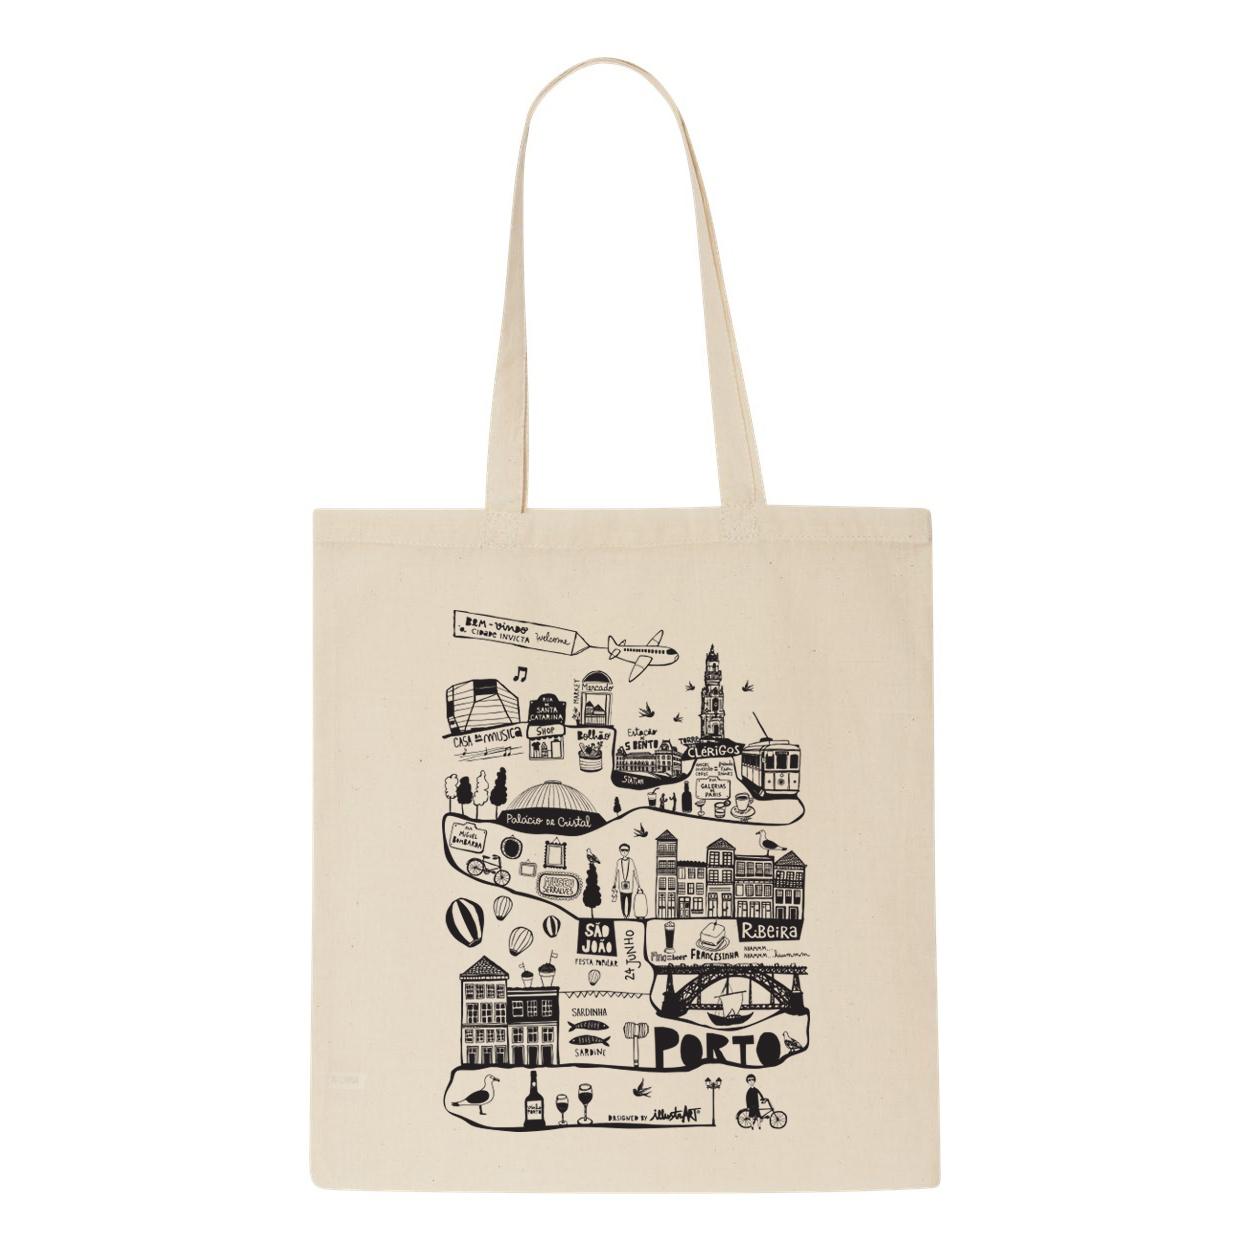 tote bag made in porto